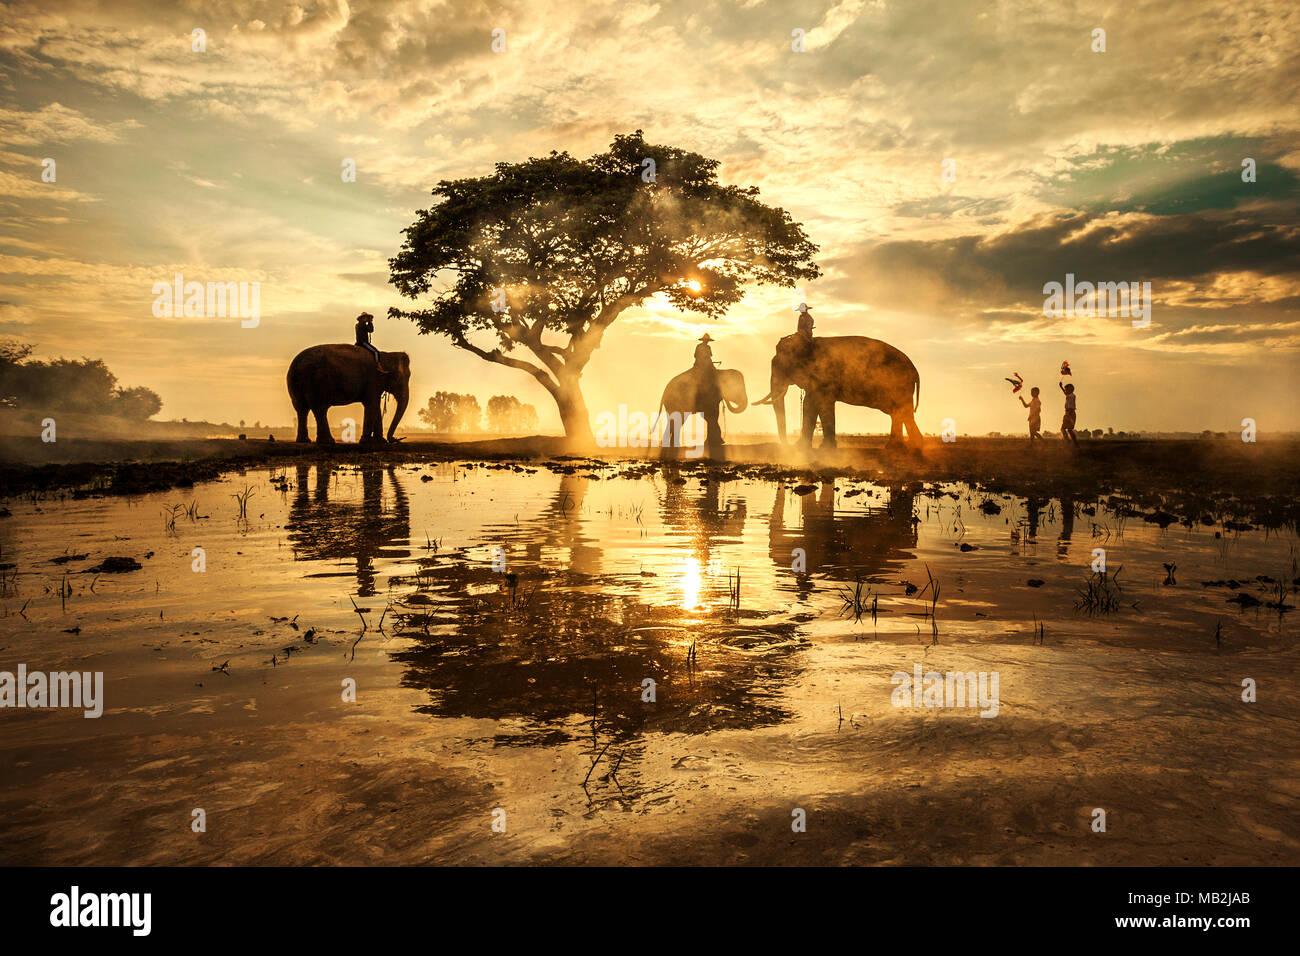 elephants under tree stock photos elephants under tree. Black Bedroom Furniture Sets. Home Design Ideas